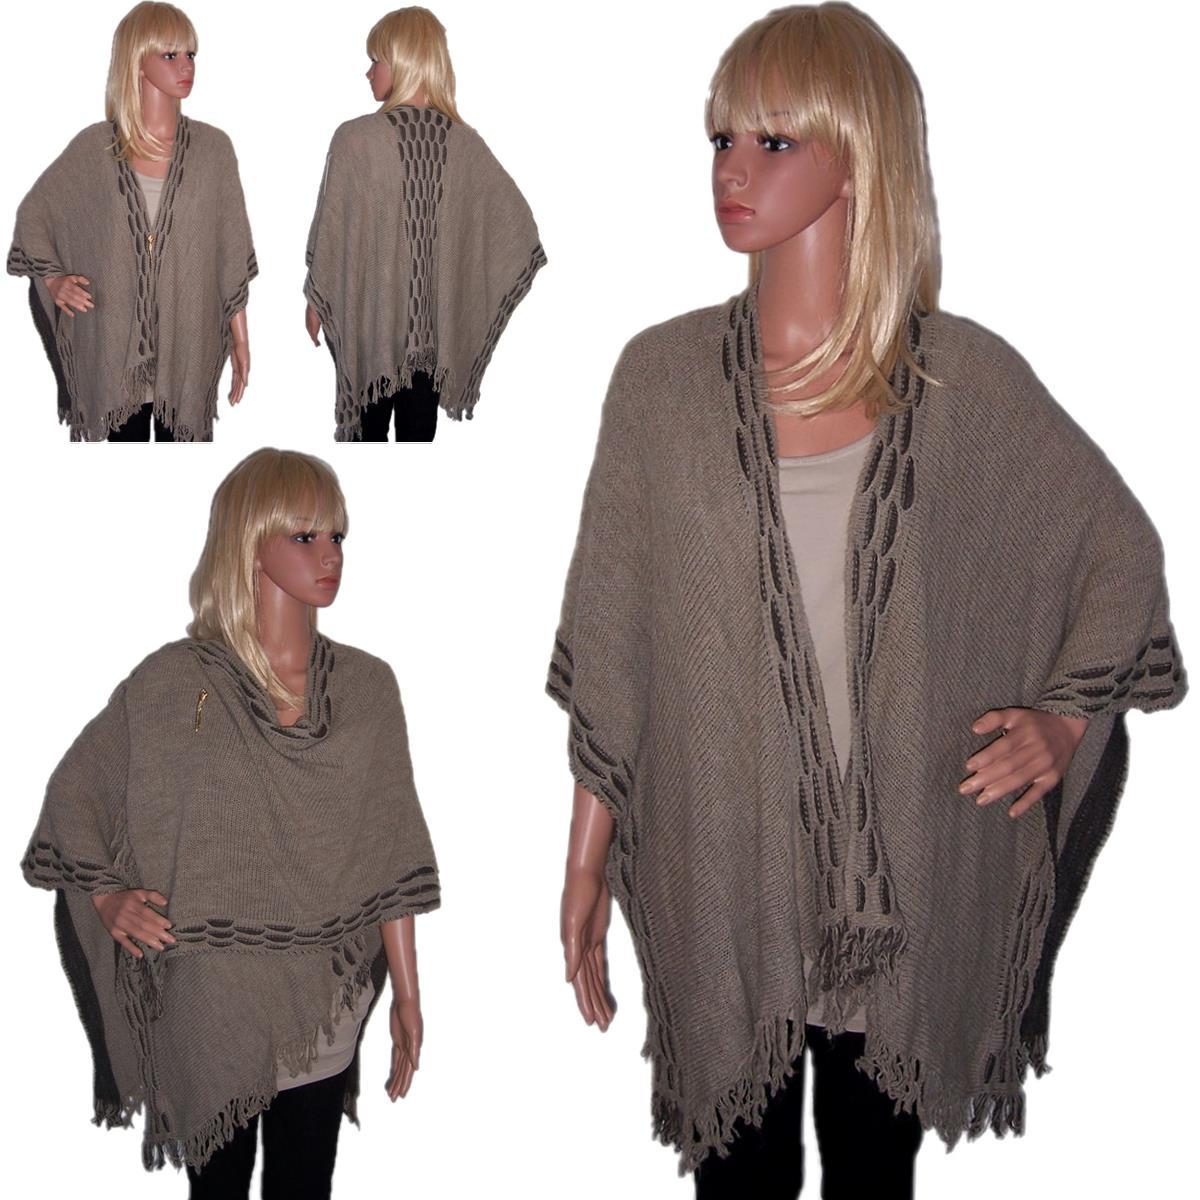 cv1 poncho berwurf cape umhang damen strickjacke cardigan tunika stola wolle ebay. Black Bedroom Furniture Sets. Home Design Ideas